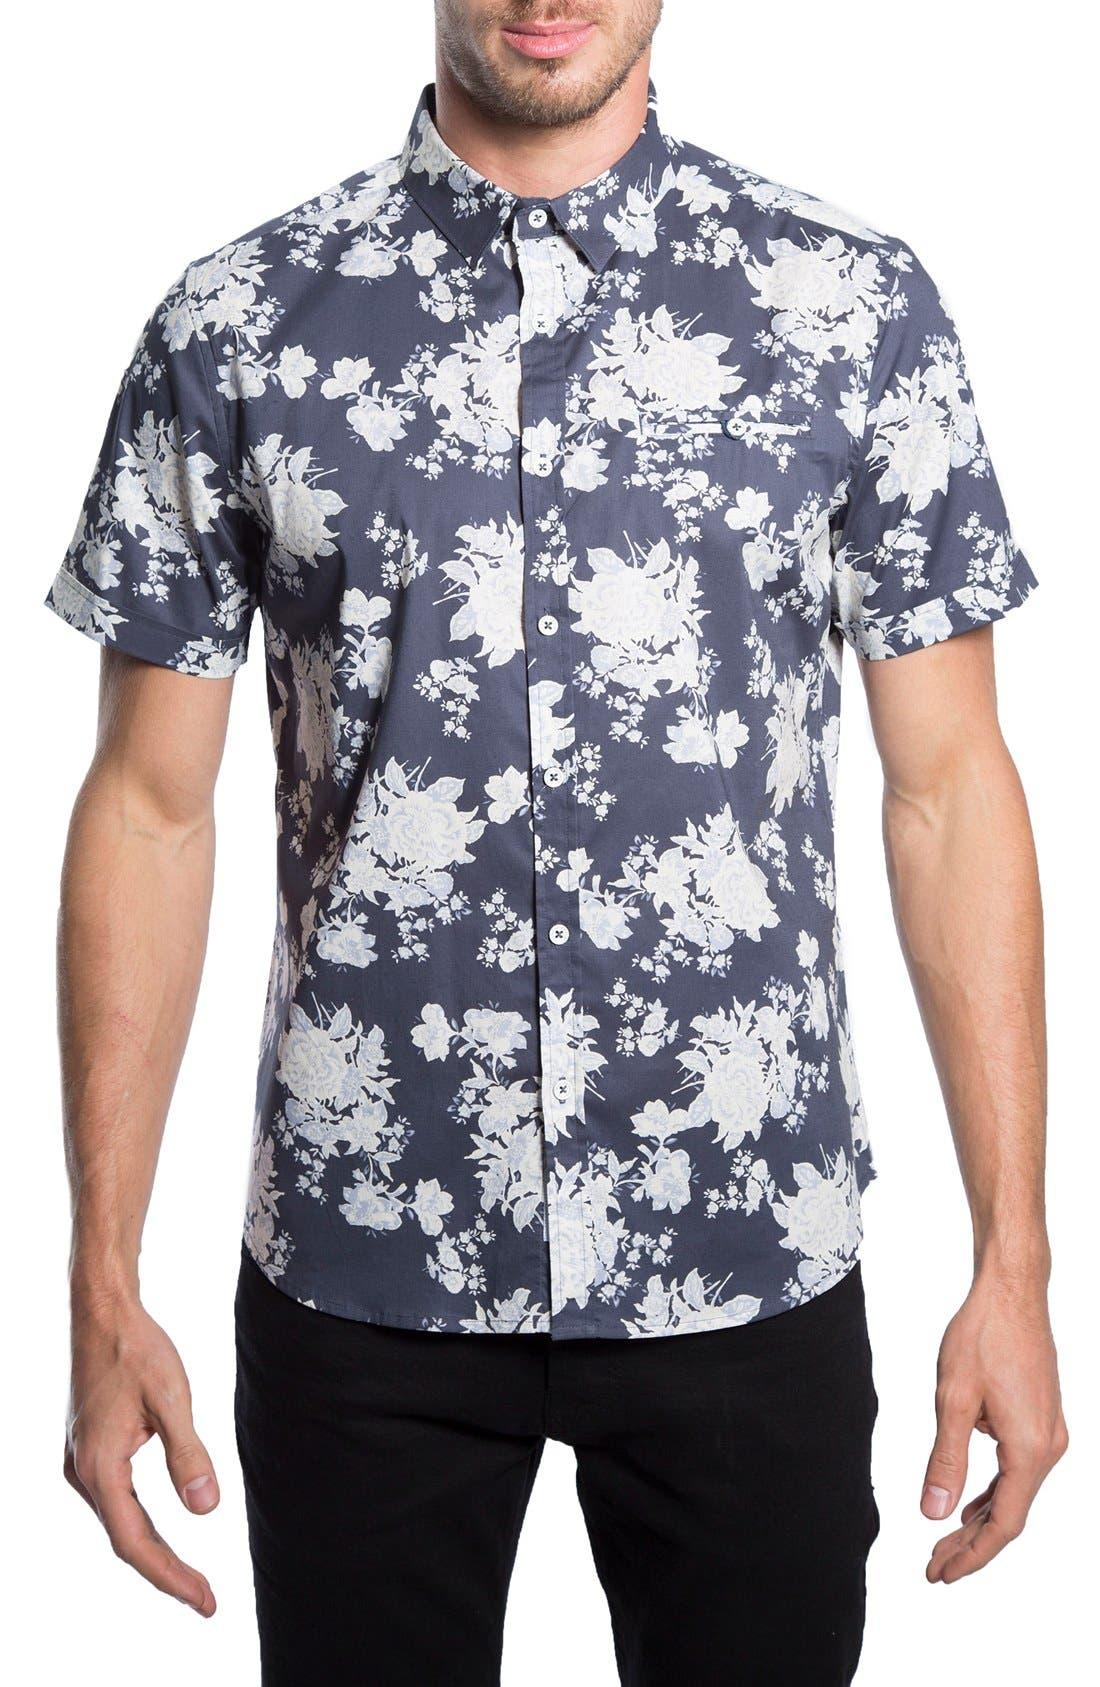 'Better Place' Trim Fit Floral Short Sleeve Woven Shirt,                             Main thumbnail 1, color,                             410